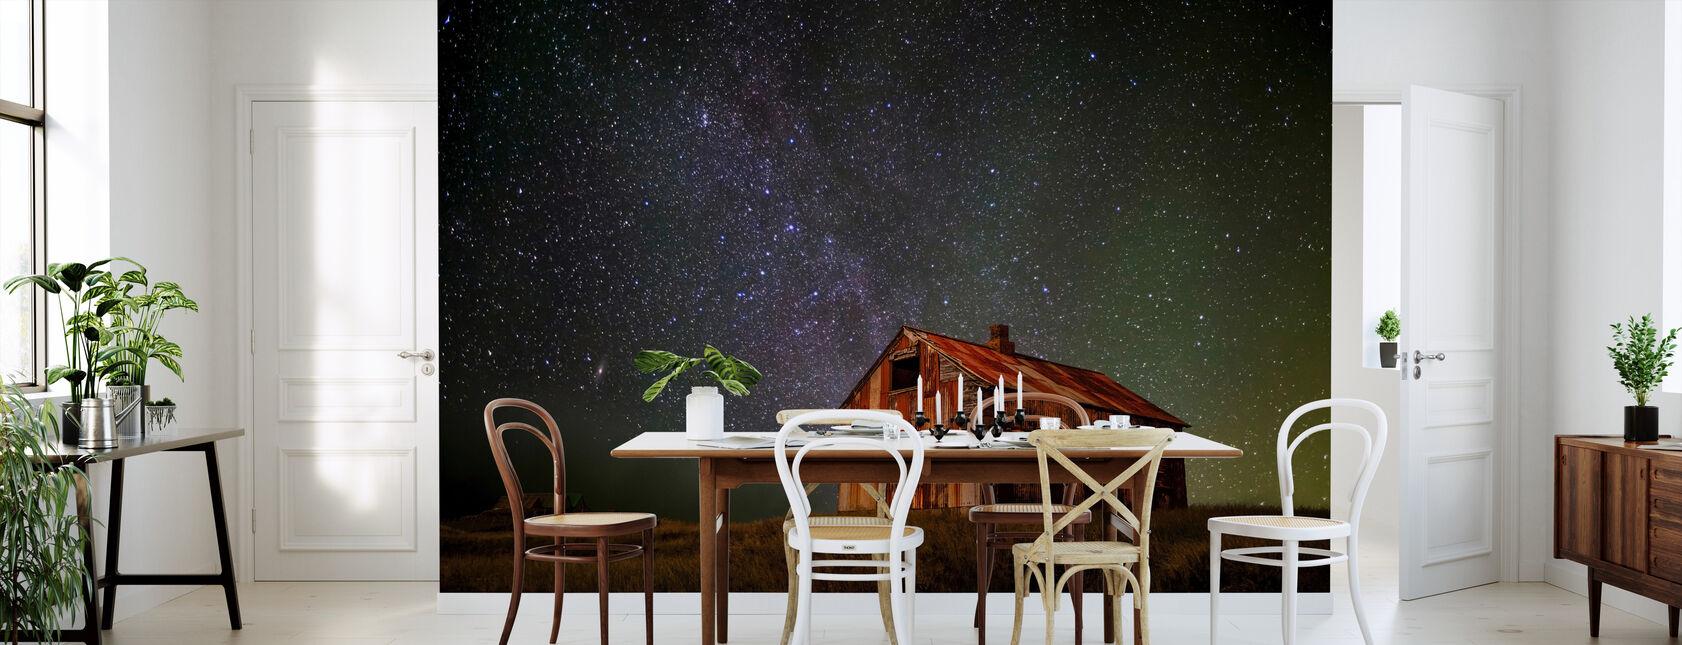 Space House - Tapetti - Keittiö